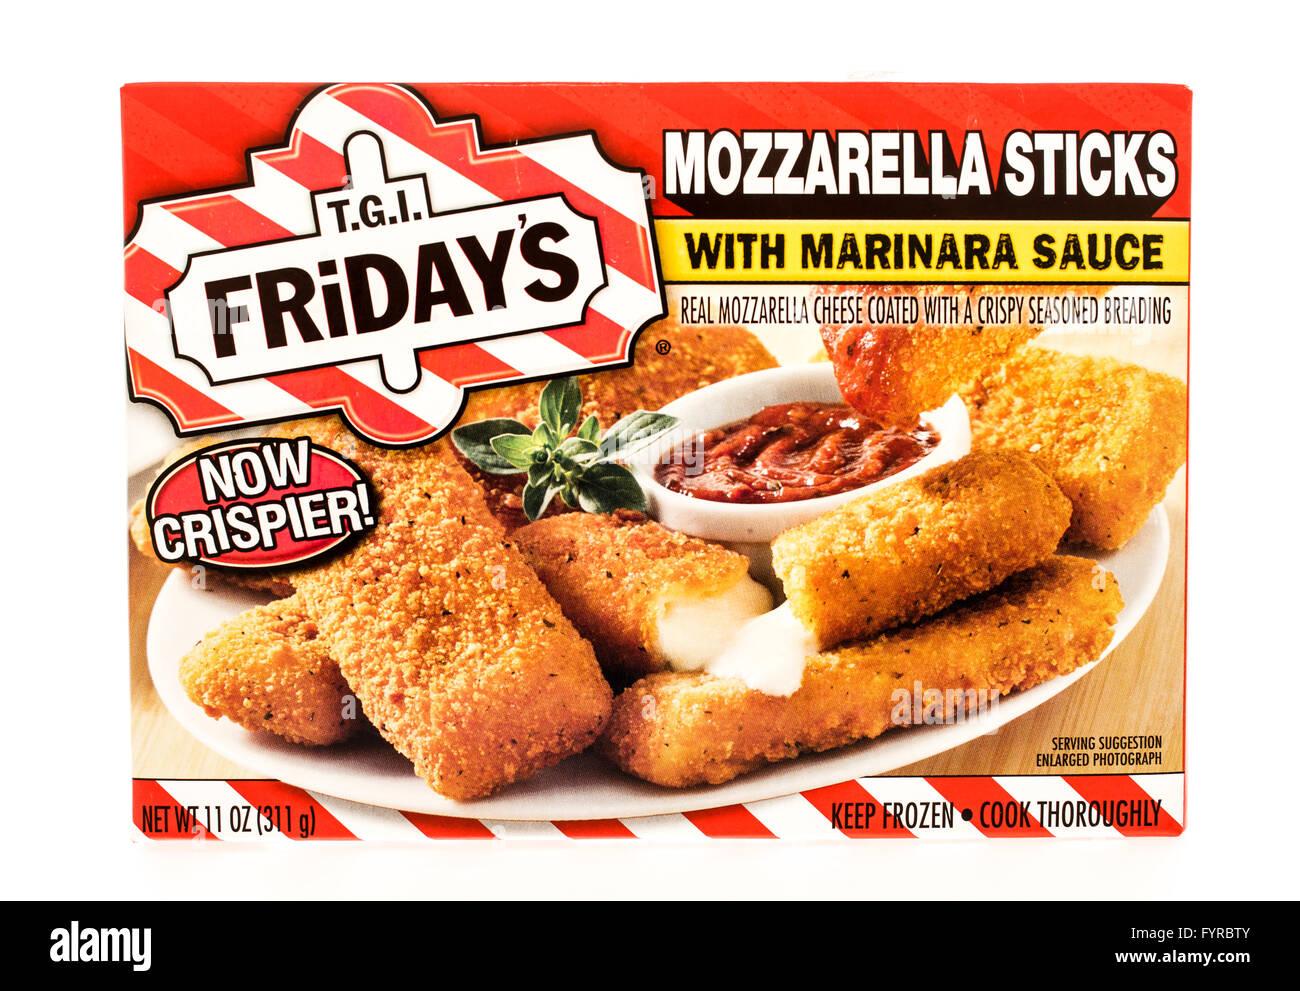 Winneconne, WI - 7 August 2015:  A box of T.G.I. Friday's mozzarella sticks. Stock Photo